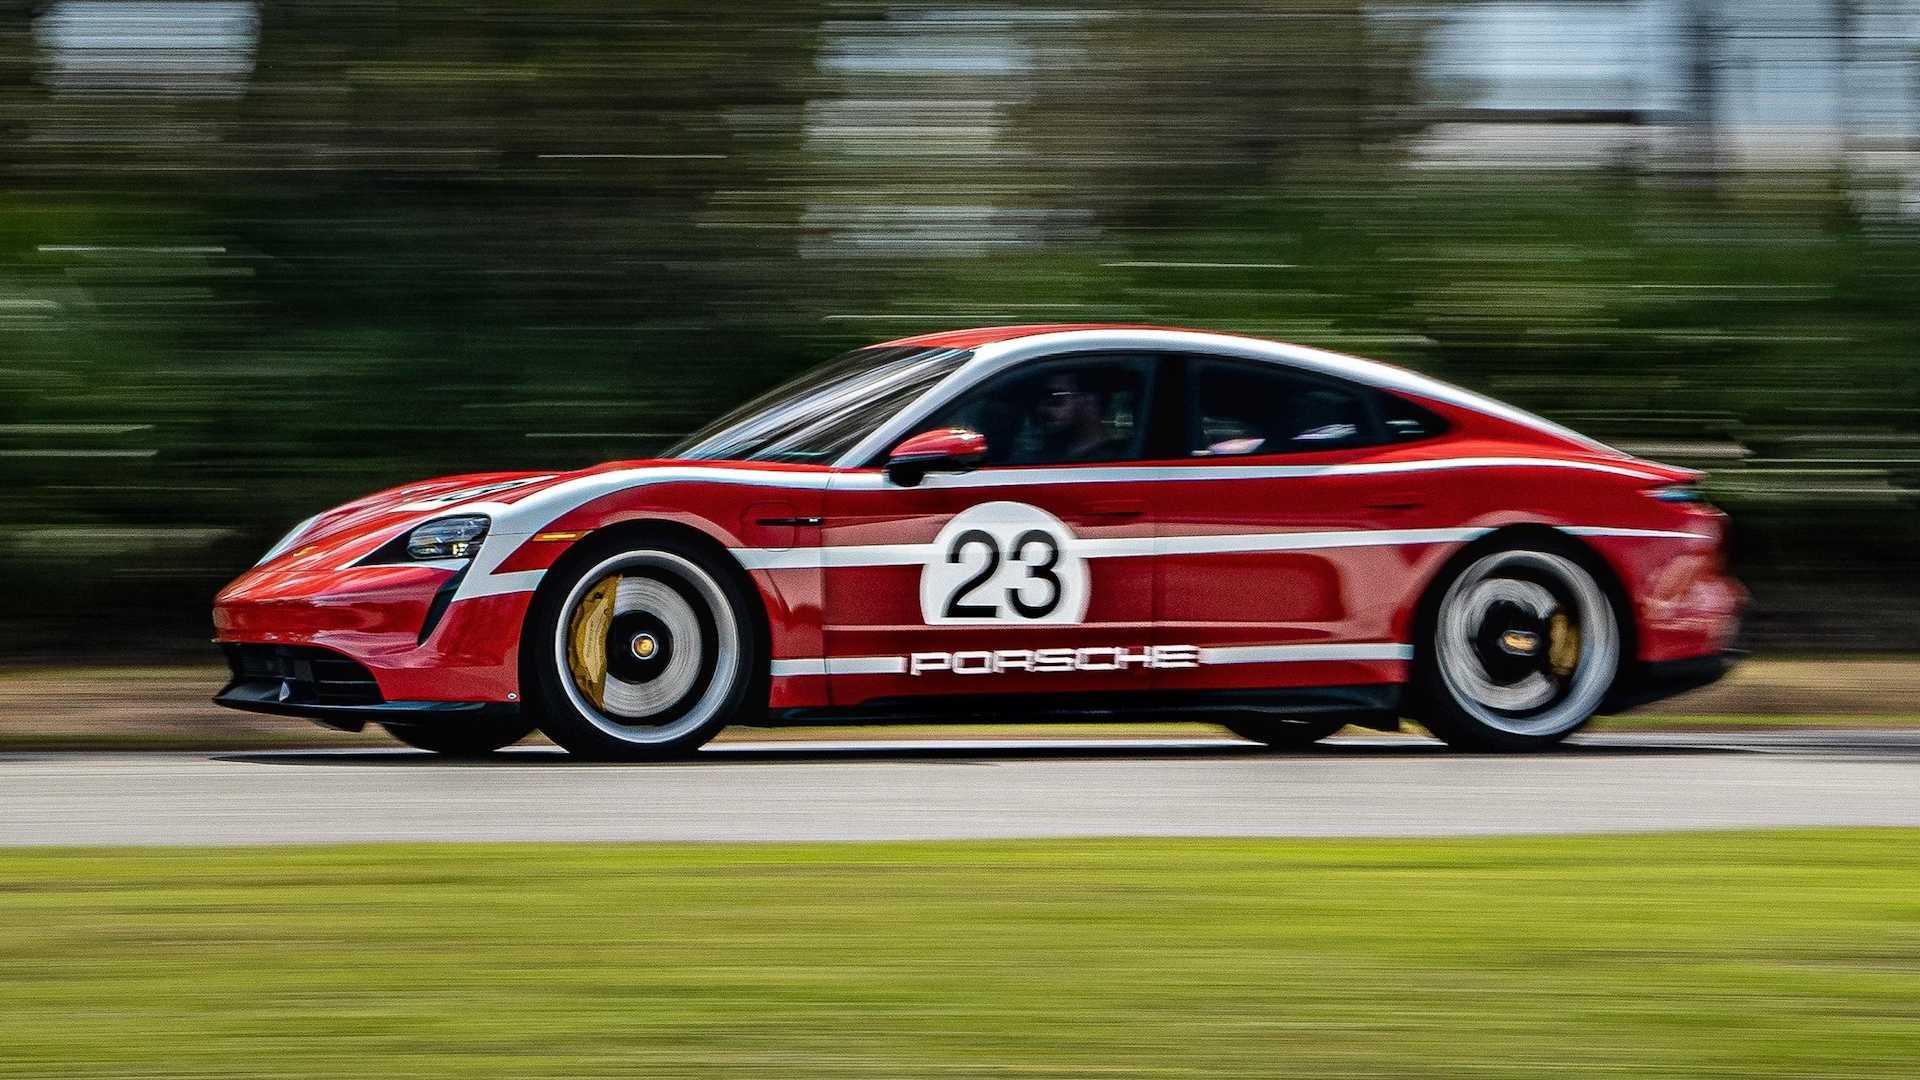 Porsche-Taycan-In-Racing-Liveries-5